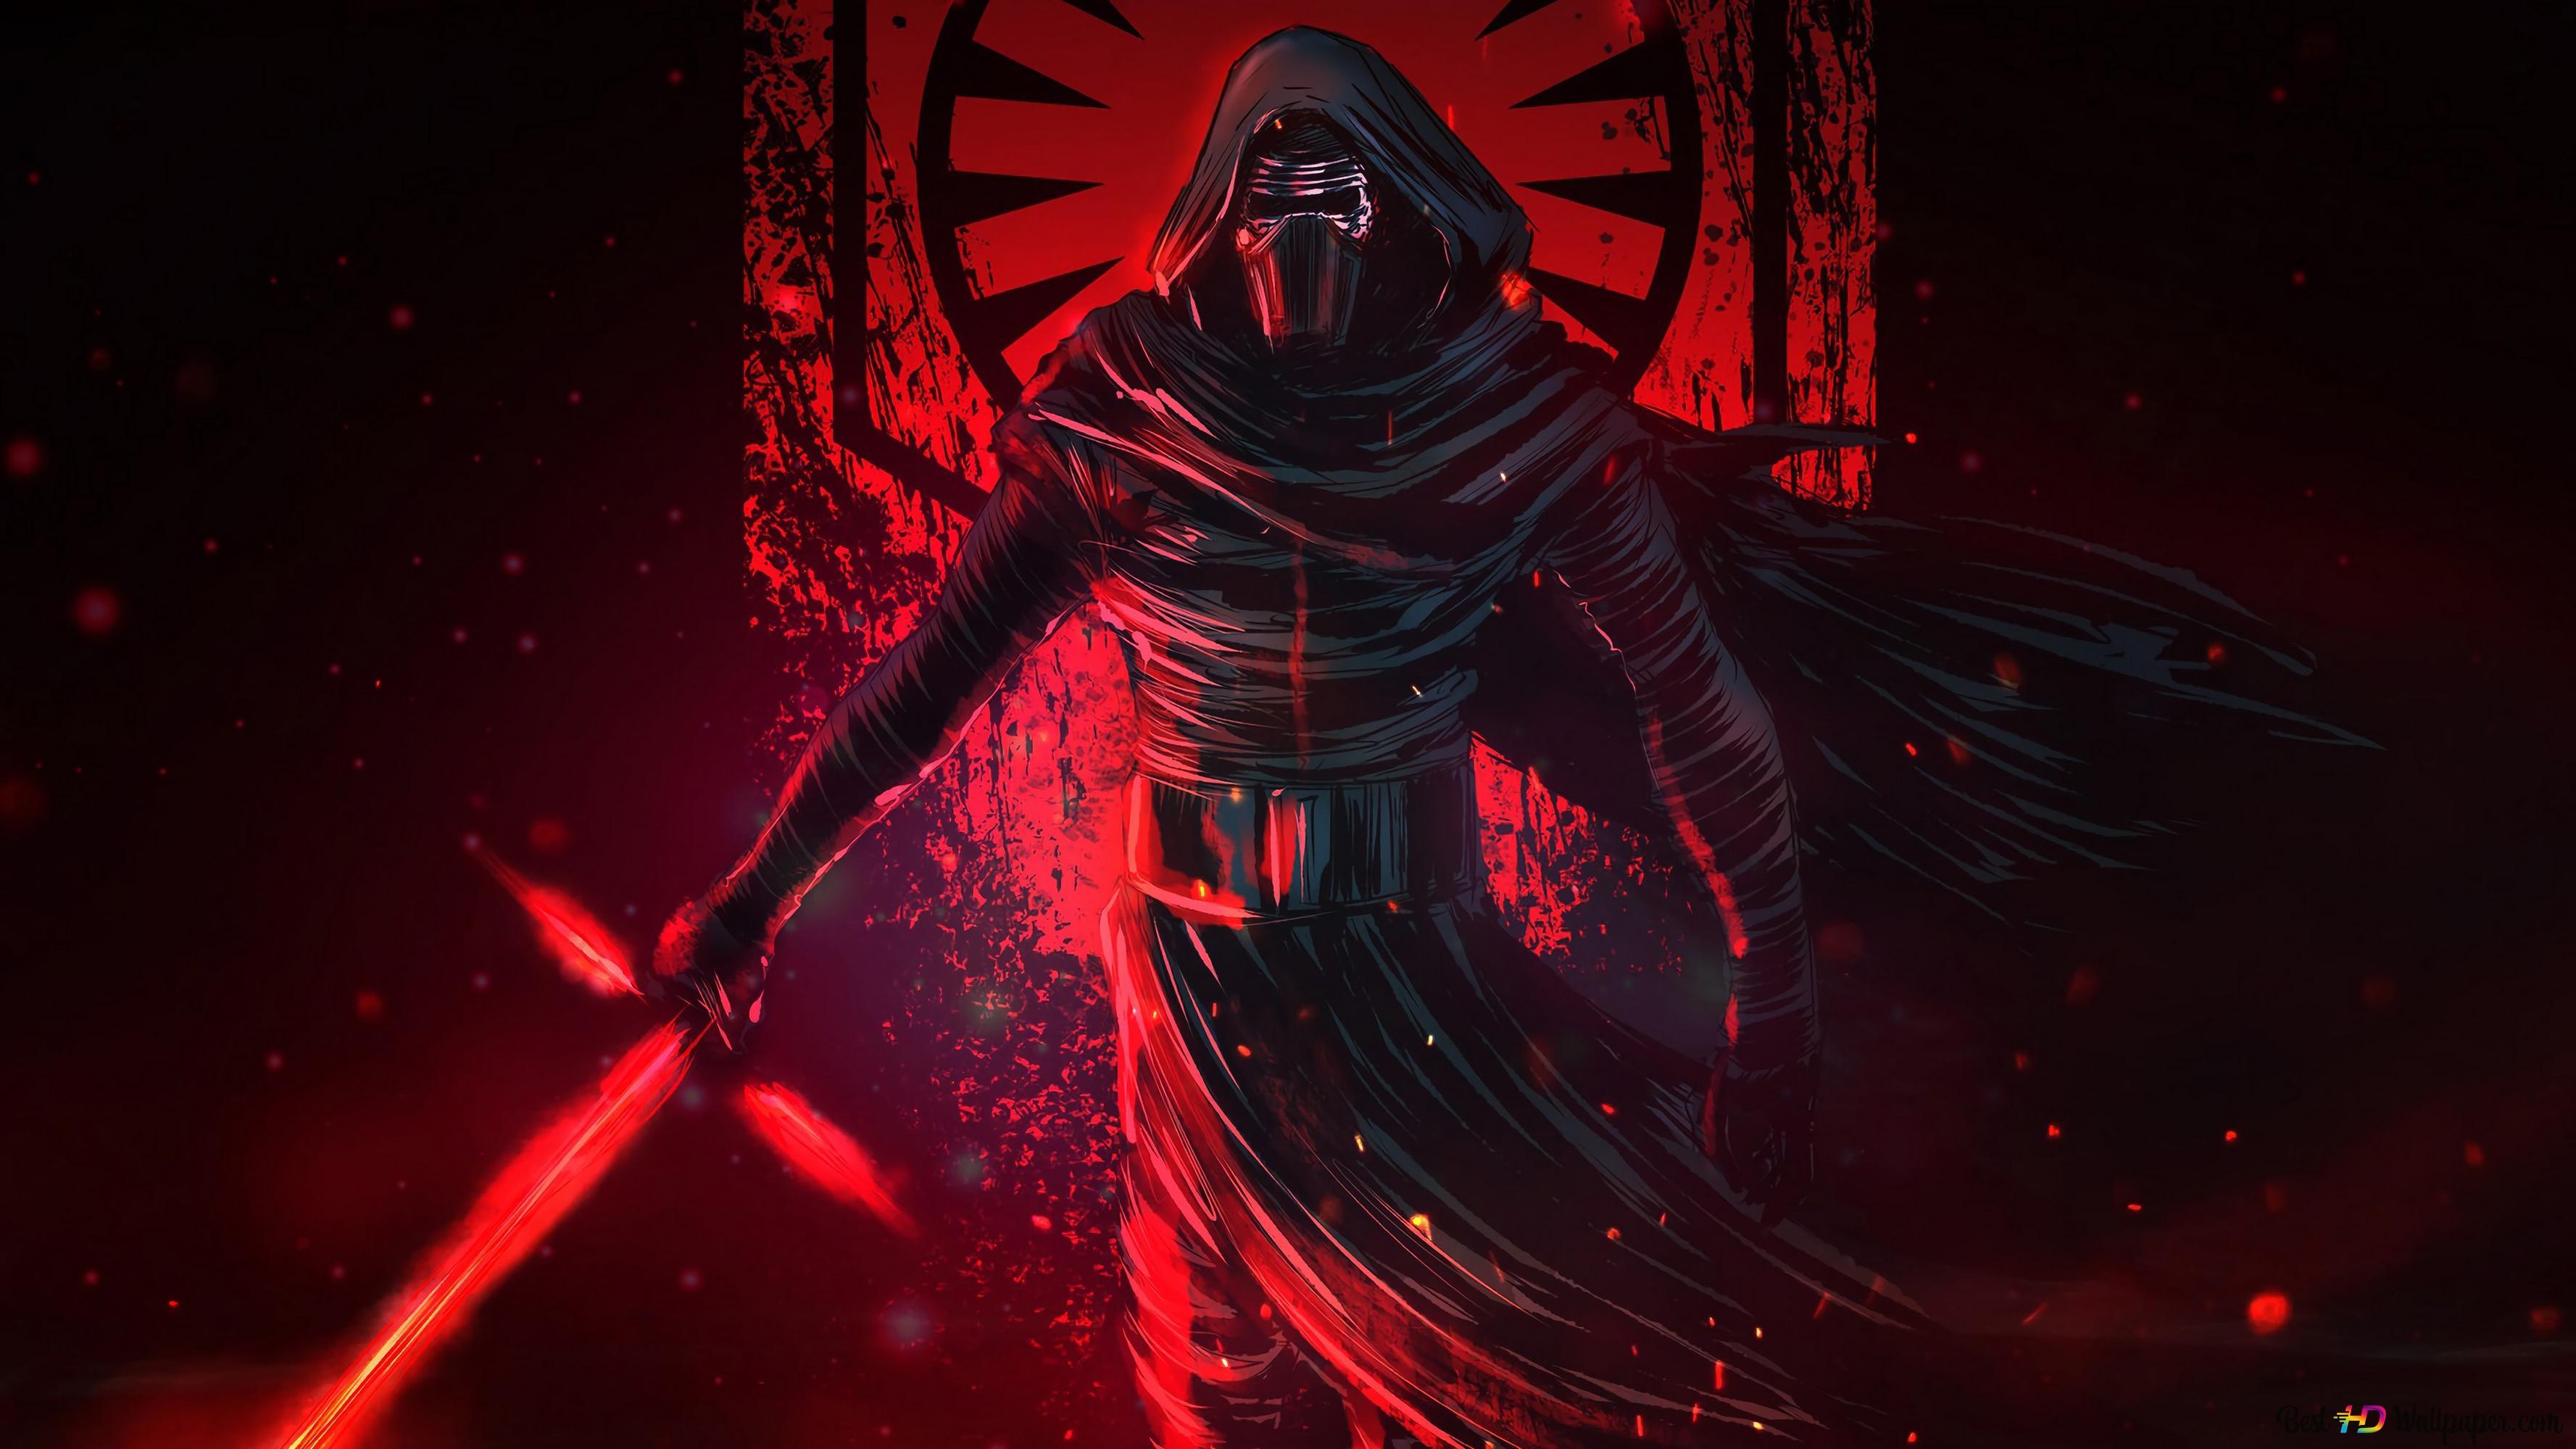 Star Wars 9 Kylo Ren Hd Wallpaper Download